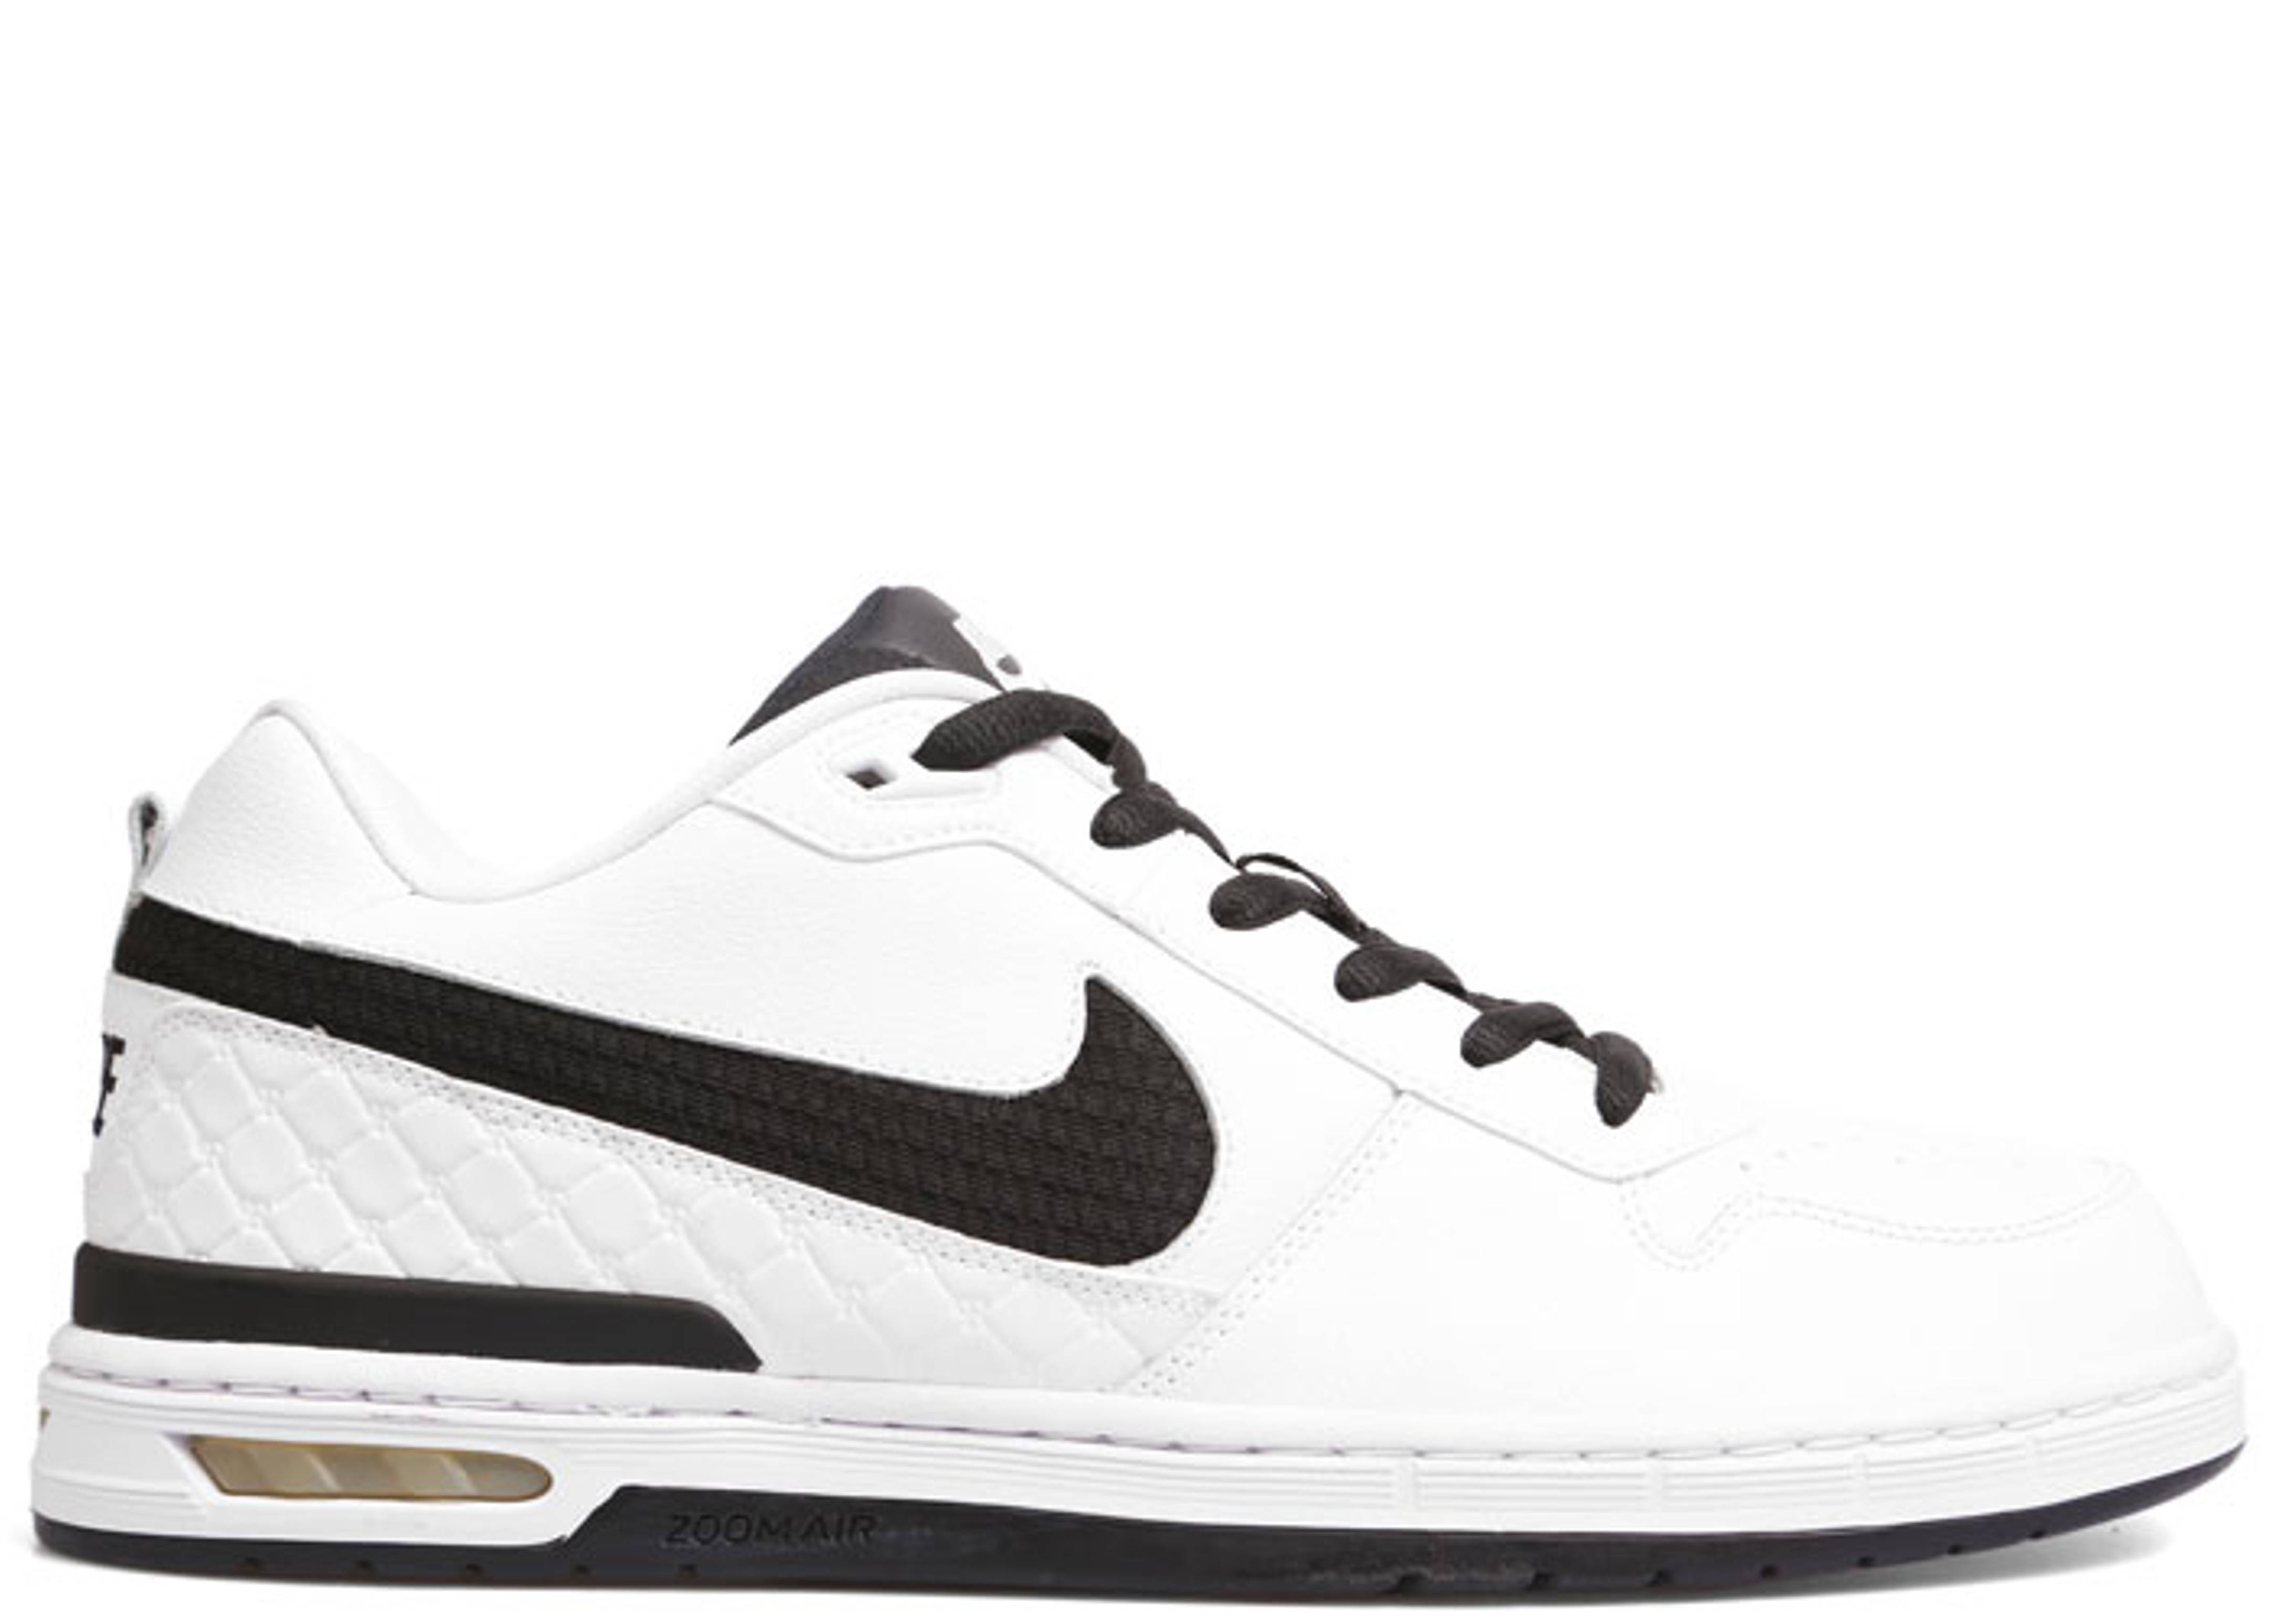 8a7f594032 Nike Paul Retro Nike Paul George Basketball Shoes - Musée des ...